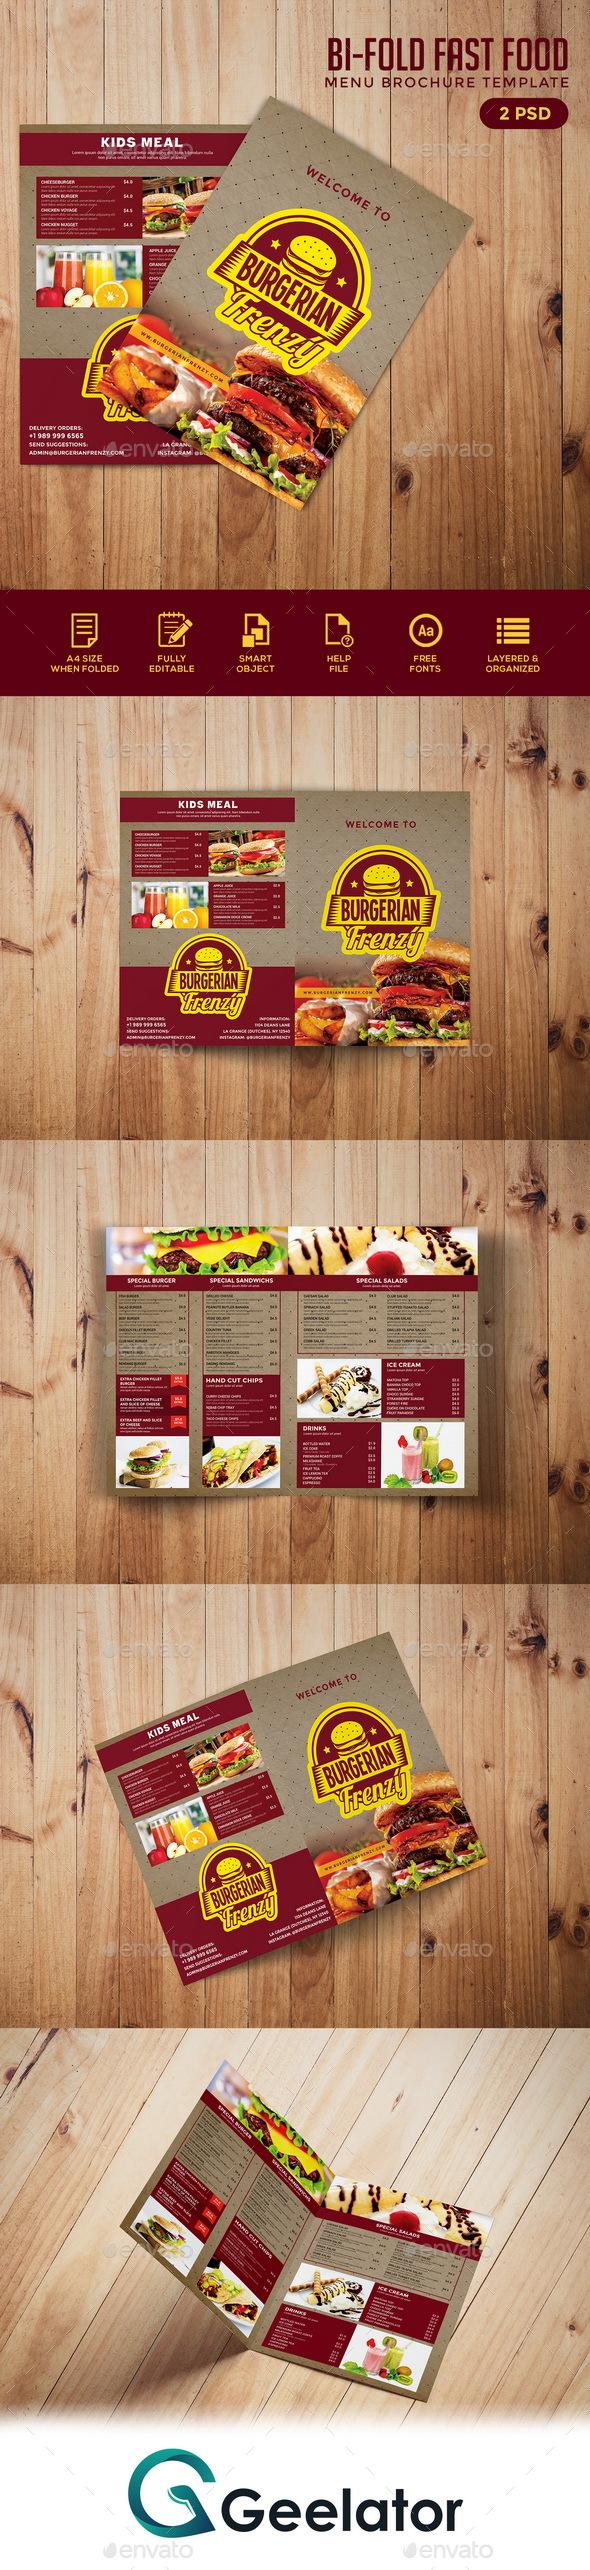 Bifold Fast Food Menu Brochure Template By Geelator GraphicRiver - Menu brochure template